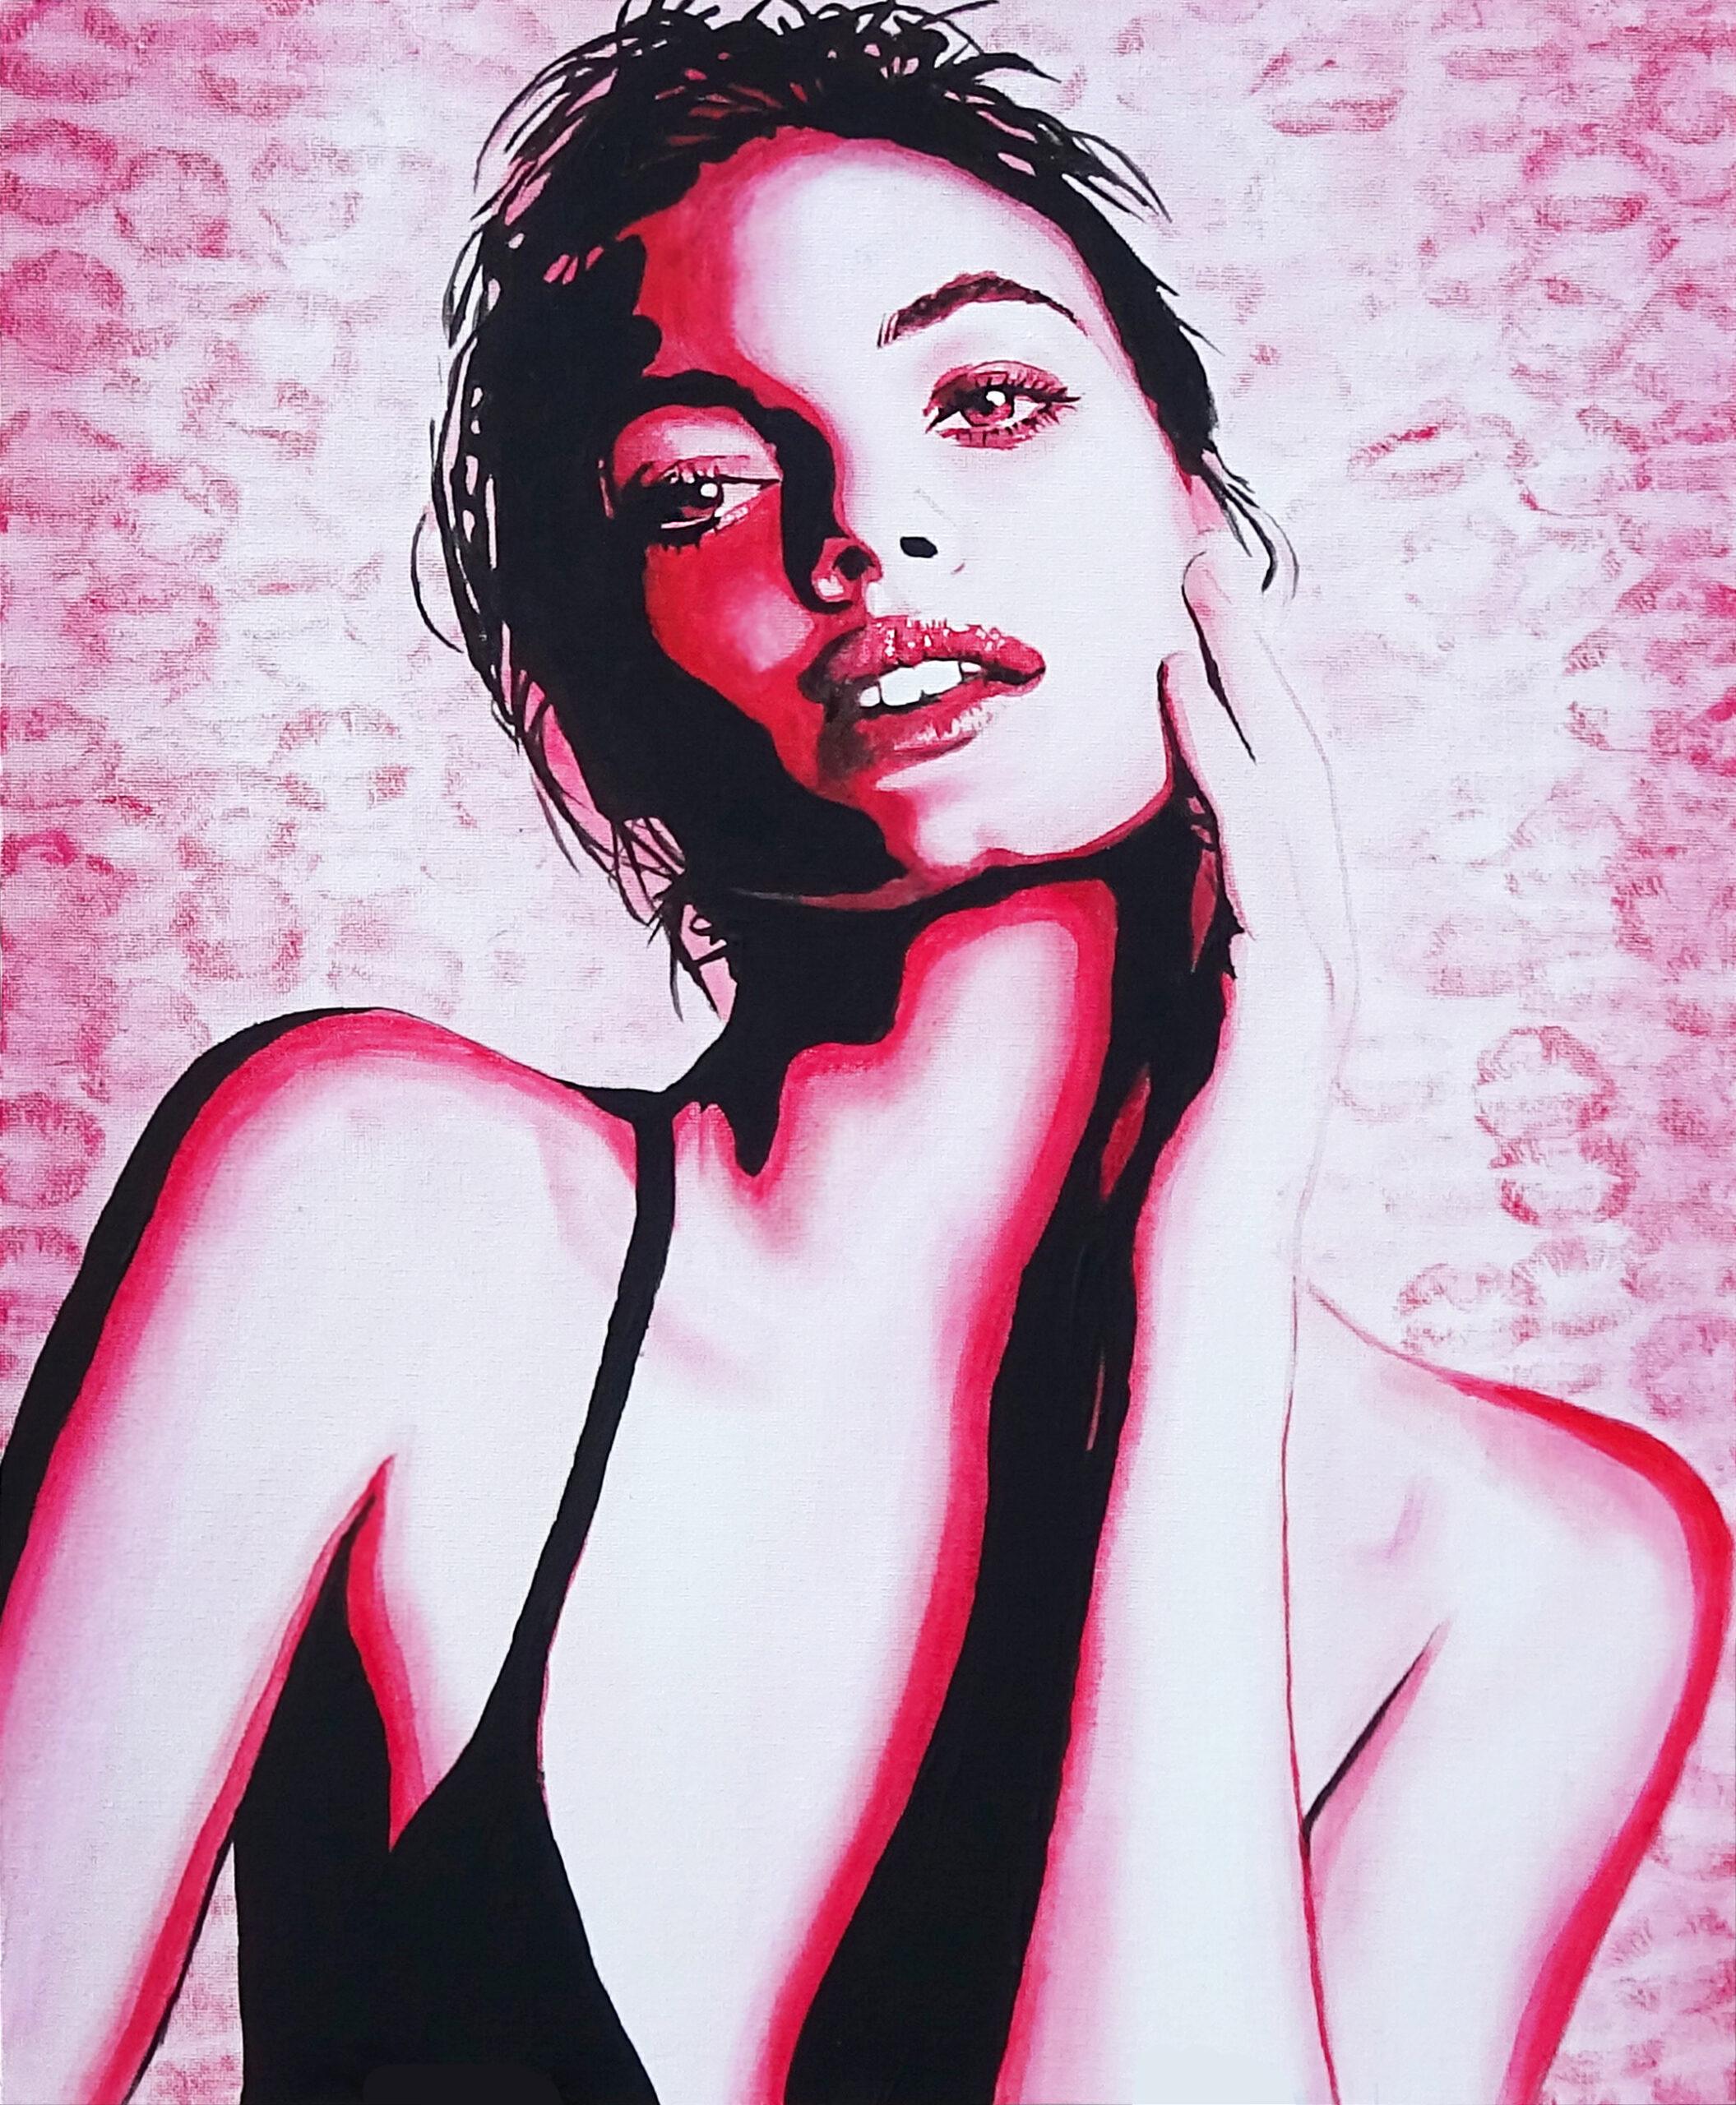 mac-cosmetics-montana-engels-artwork-collab-makeup-art-Red1